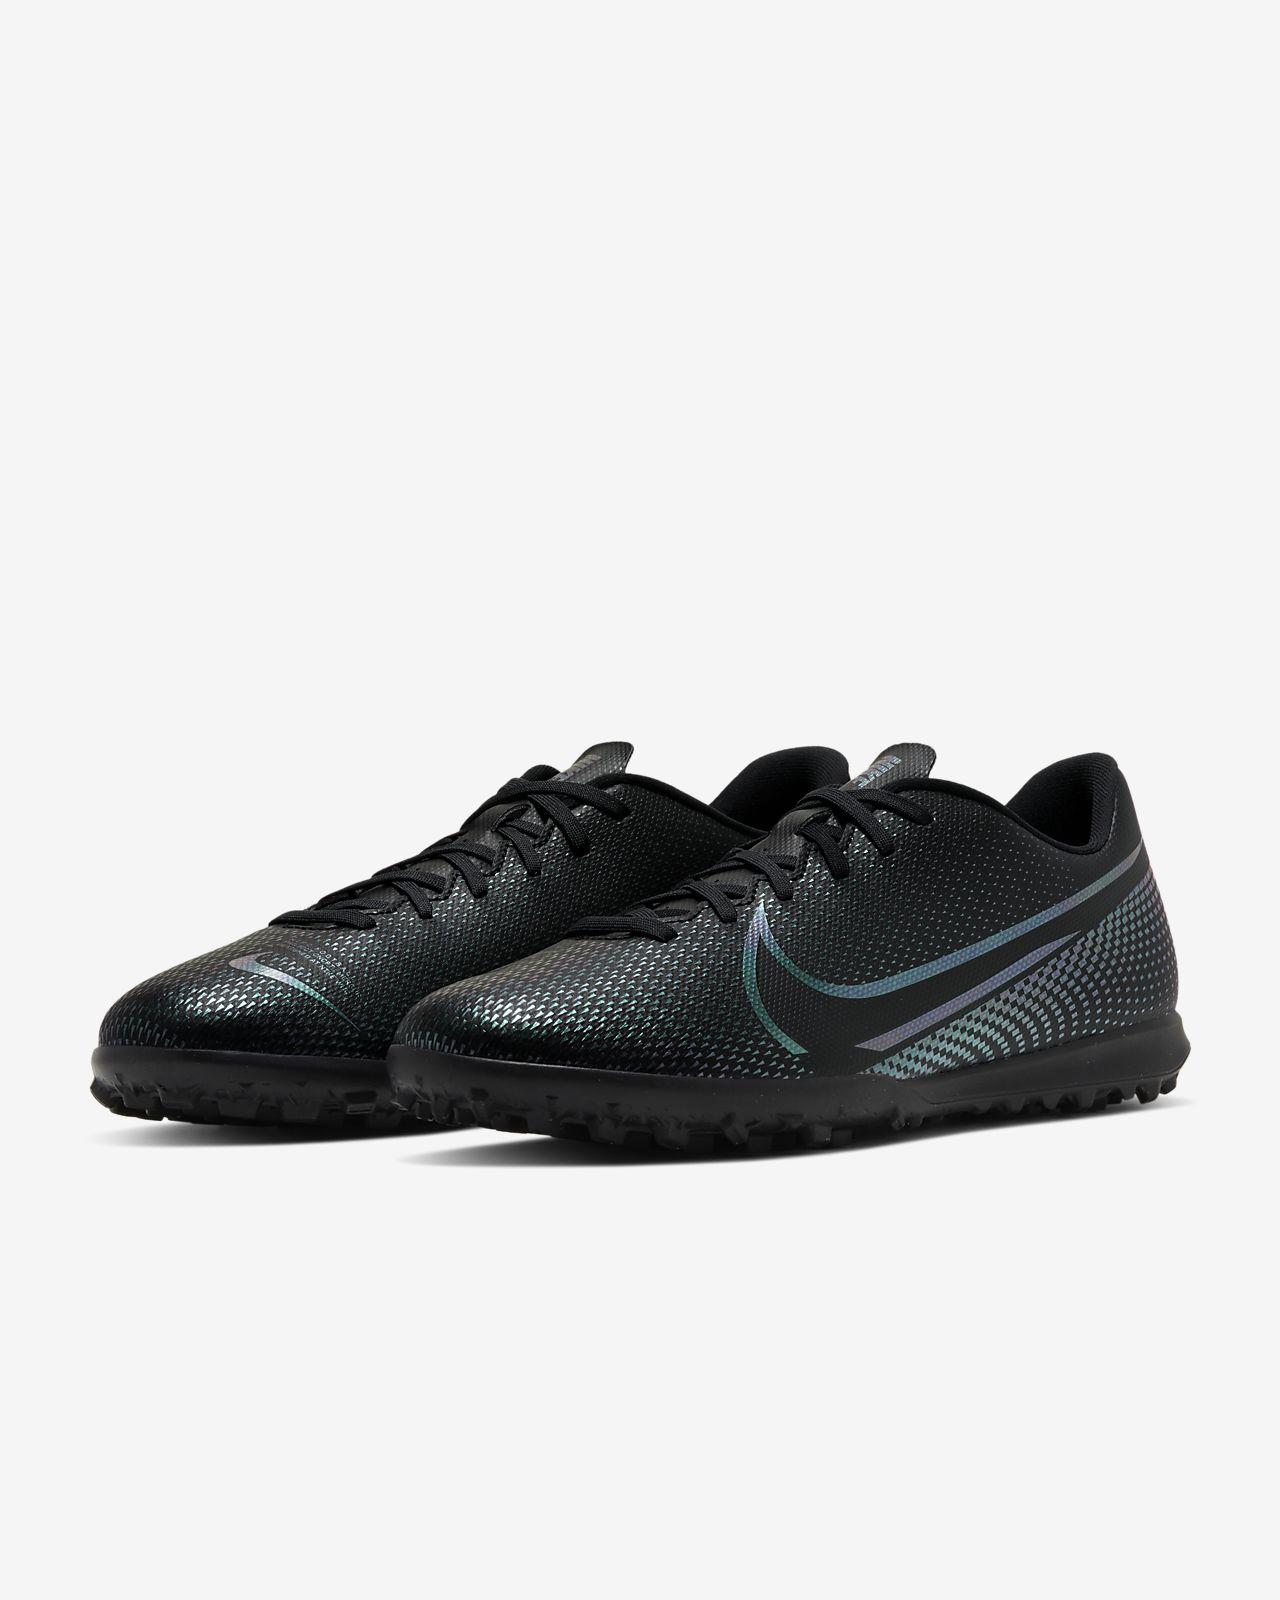 Ballena barba Ese cuerno  Nike Mercurial Vapor 13 Club TF Artificial-Turf Football Shoe. Nike AU